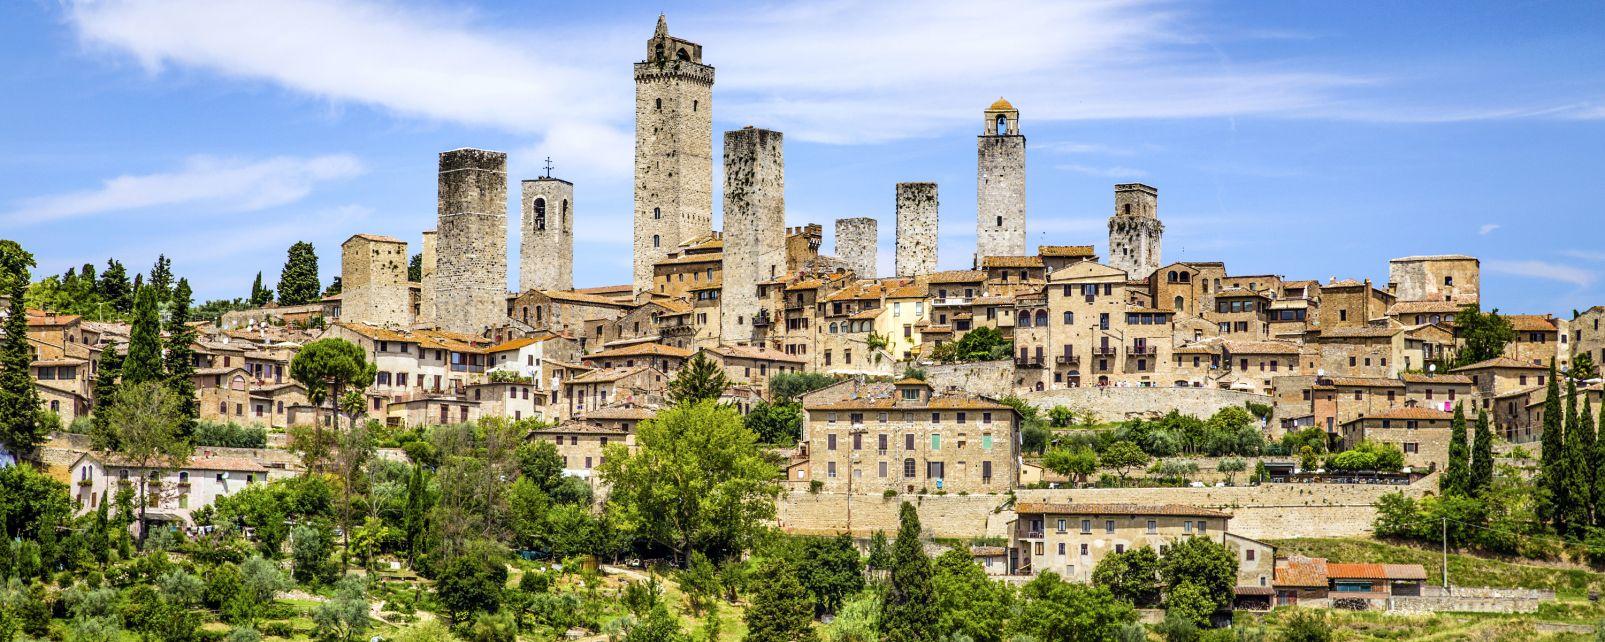 Les monuments, San Gimignano Sienne Toscane Italie tour